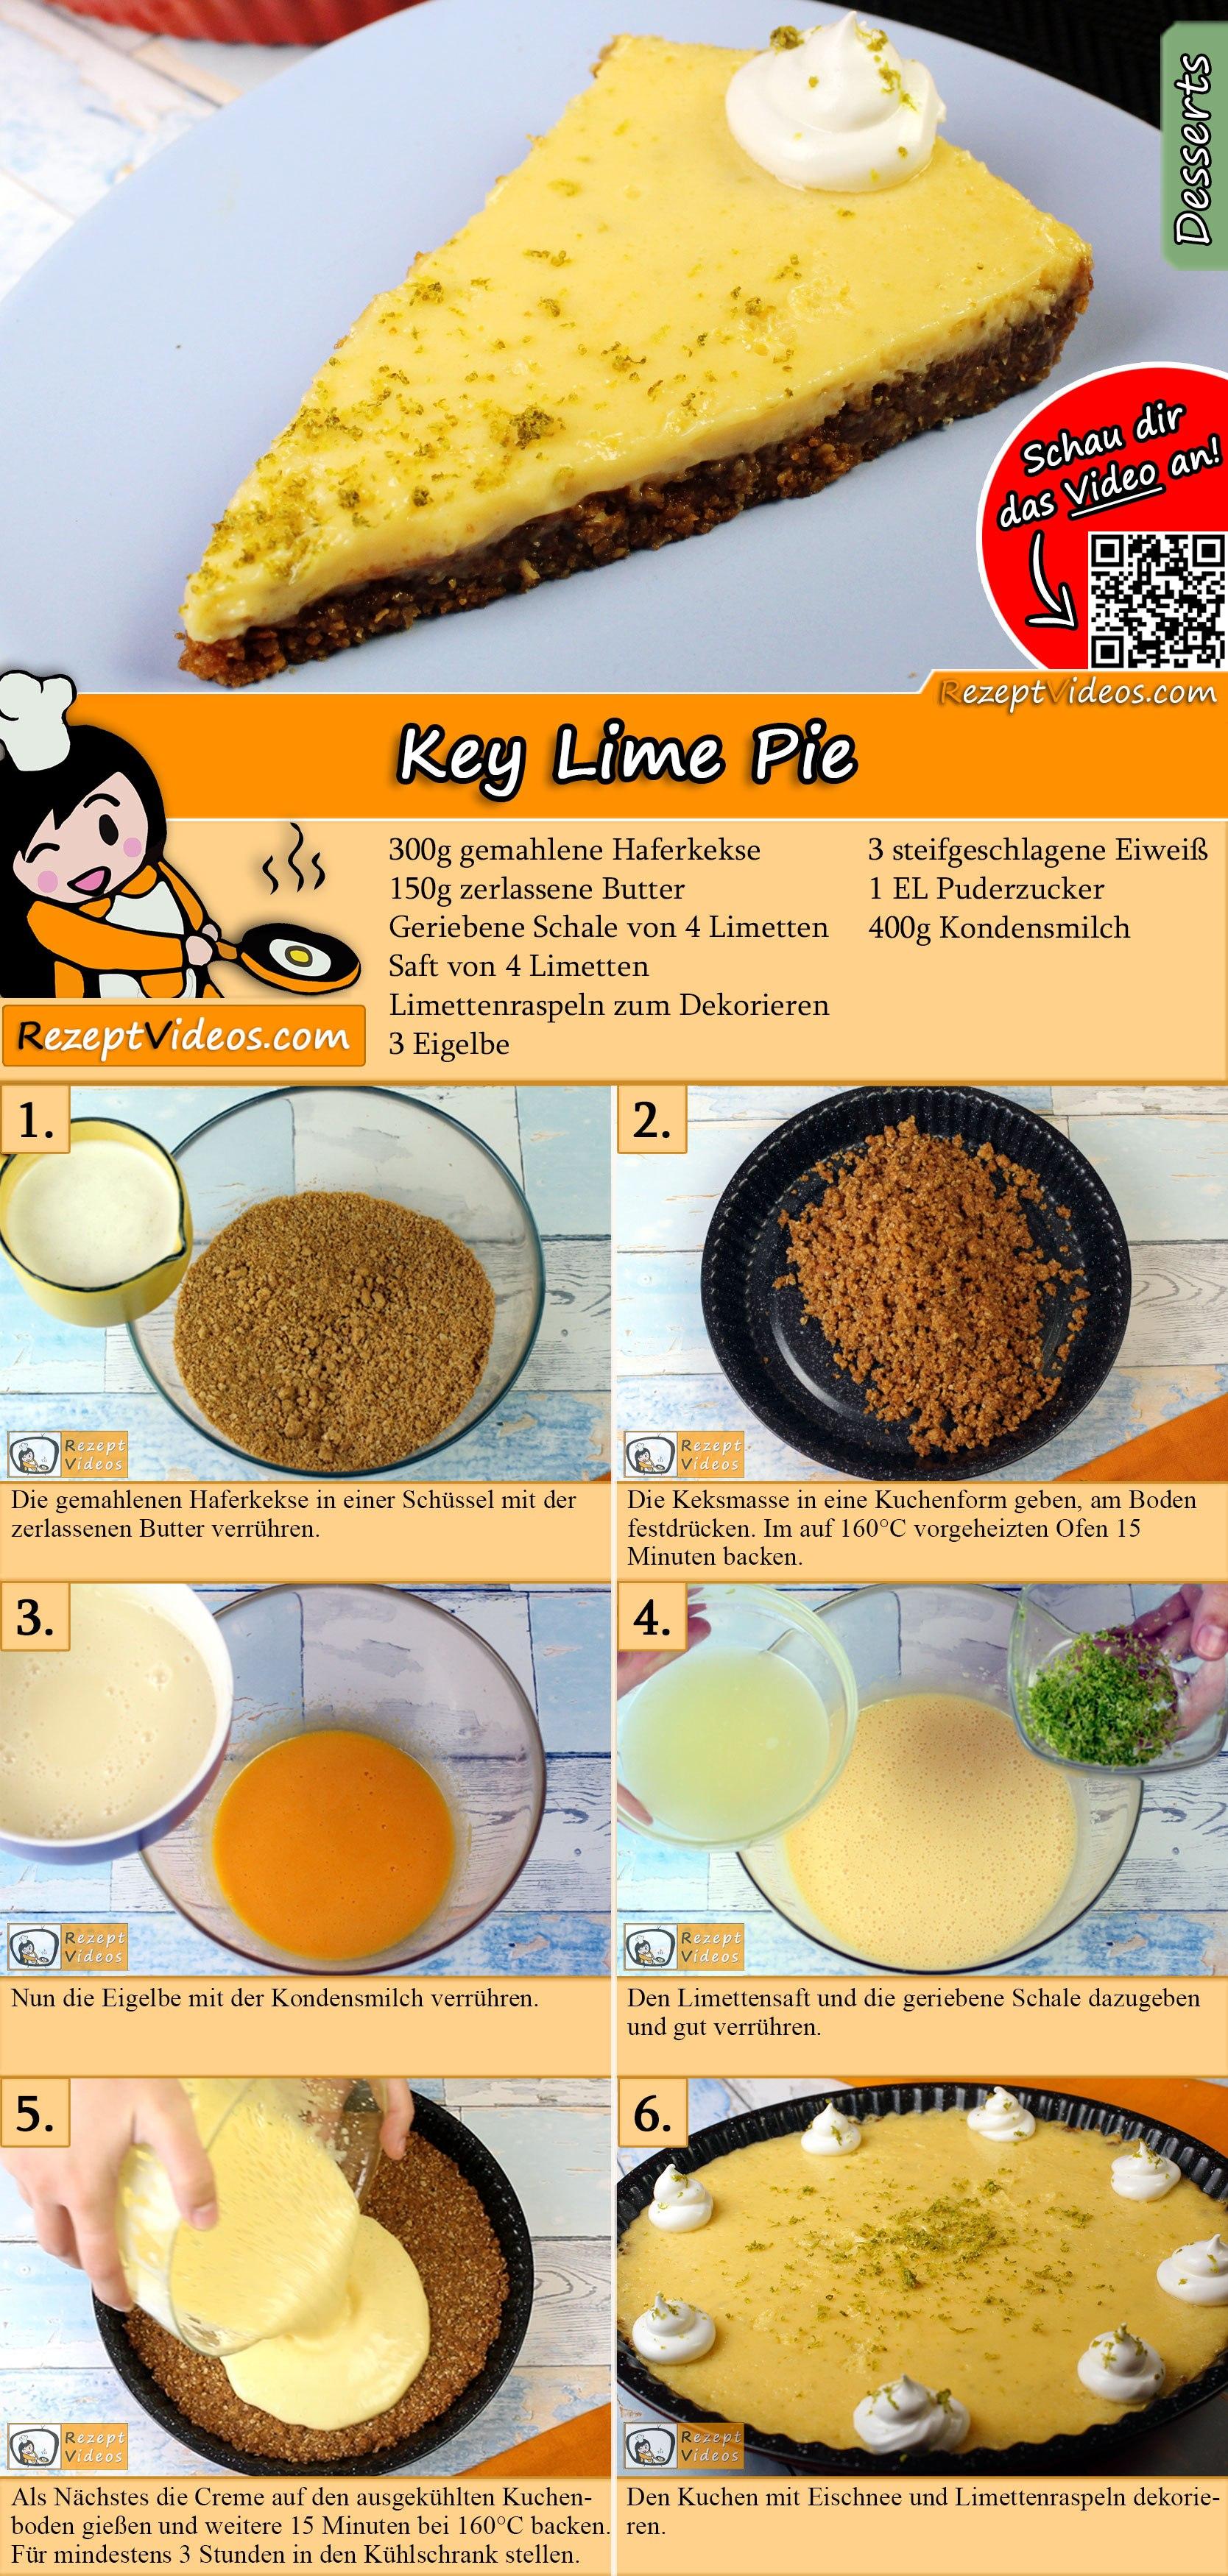 Key Lime Pie Rezept mit Video